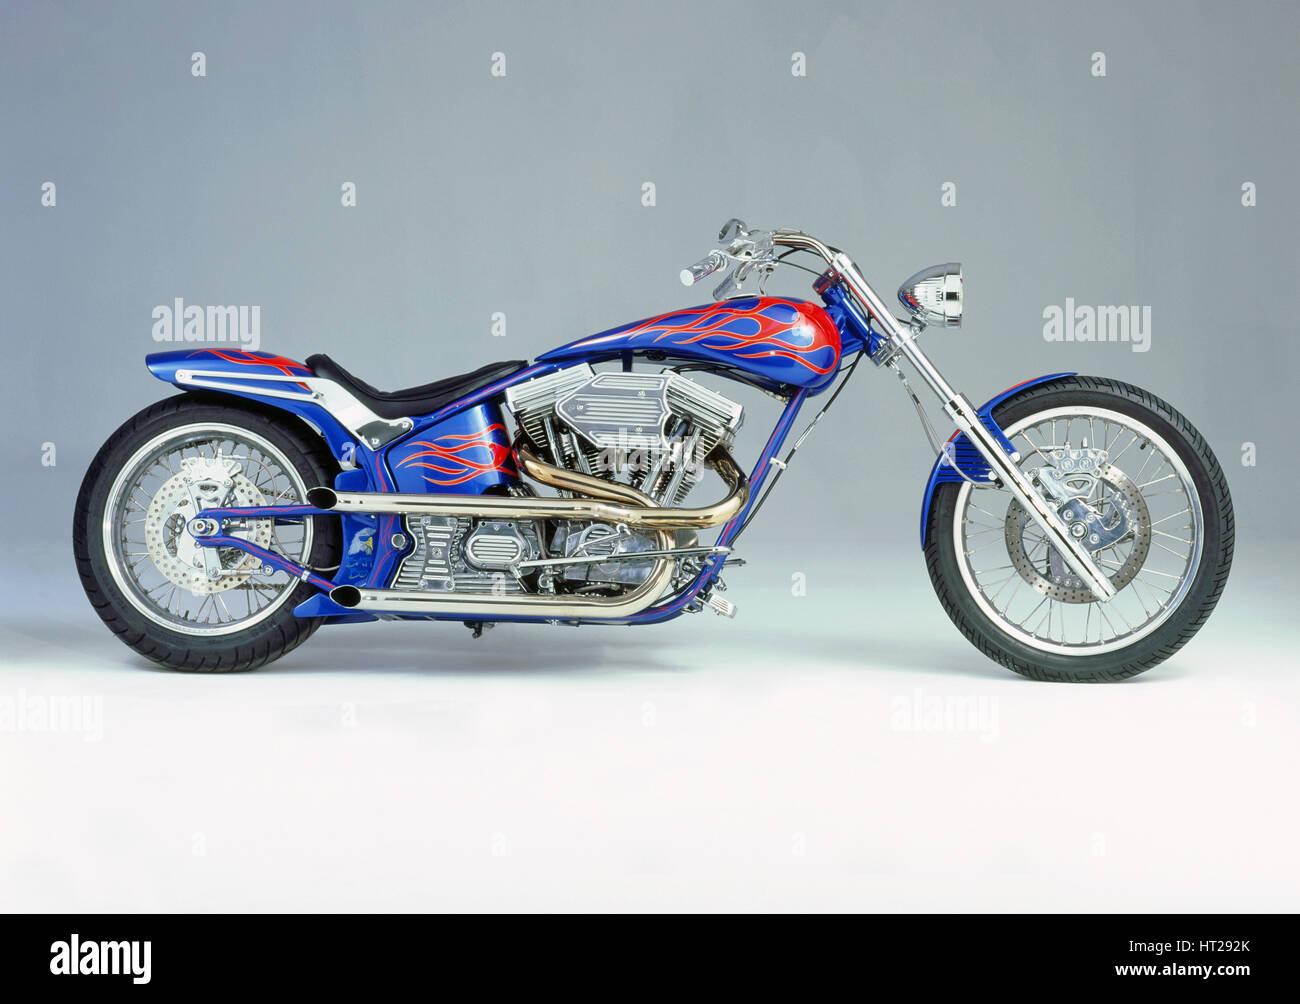 1996 Harley Davidson Batt Boy by Battistinis custom conversions. Artist: Unknown. - Stock Image